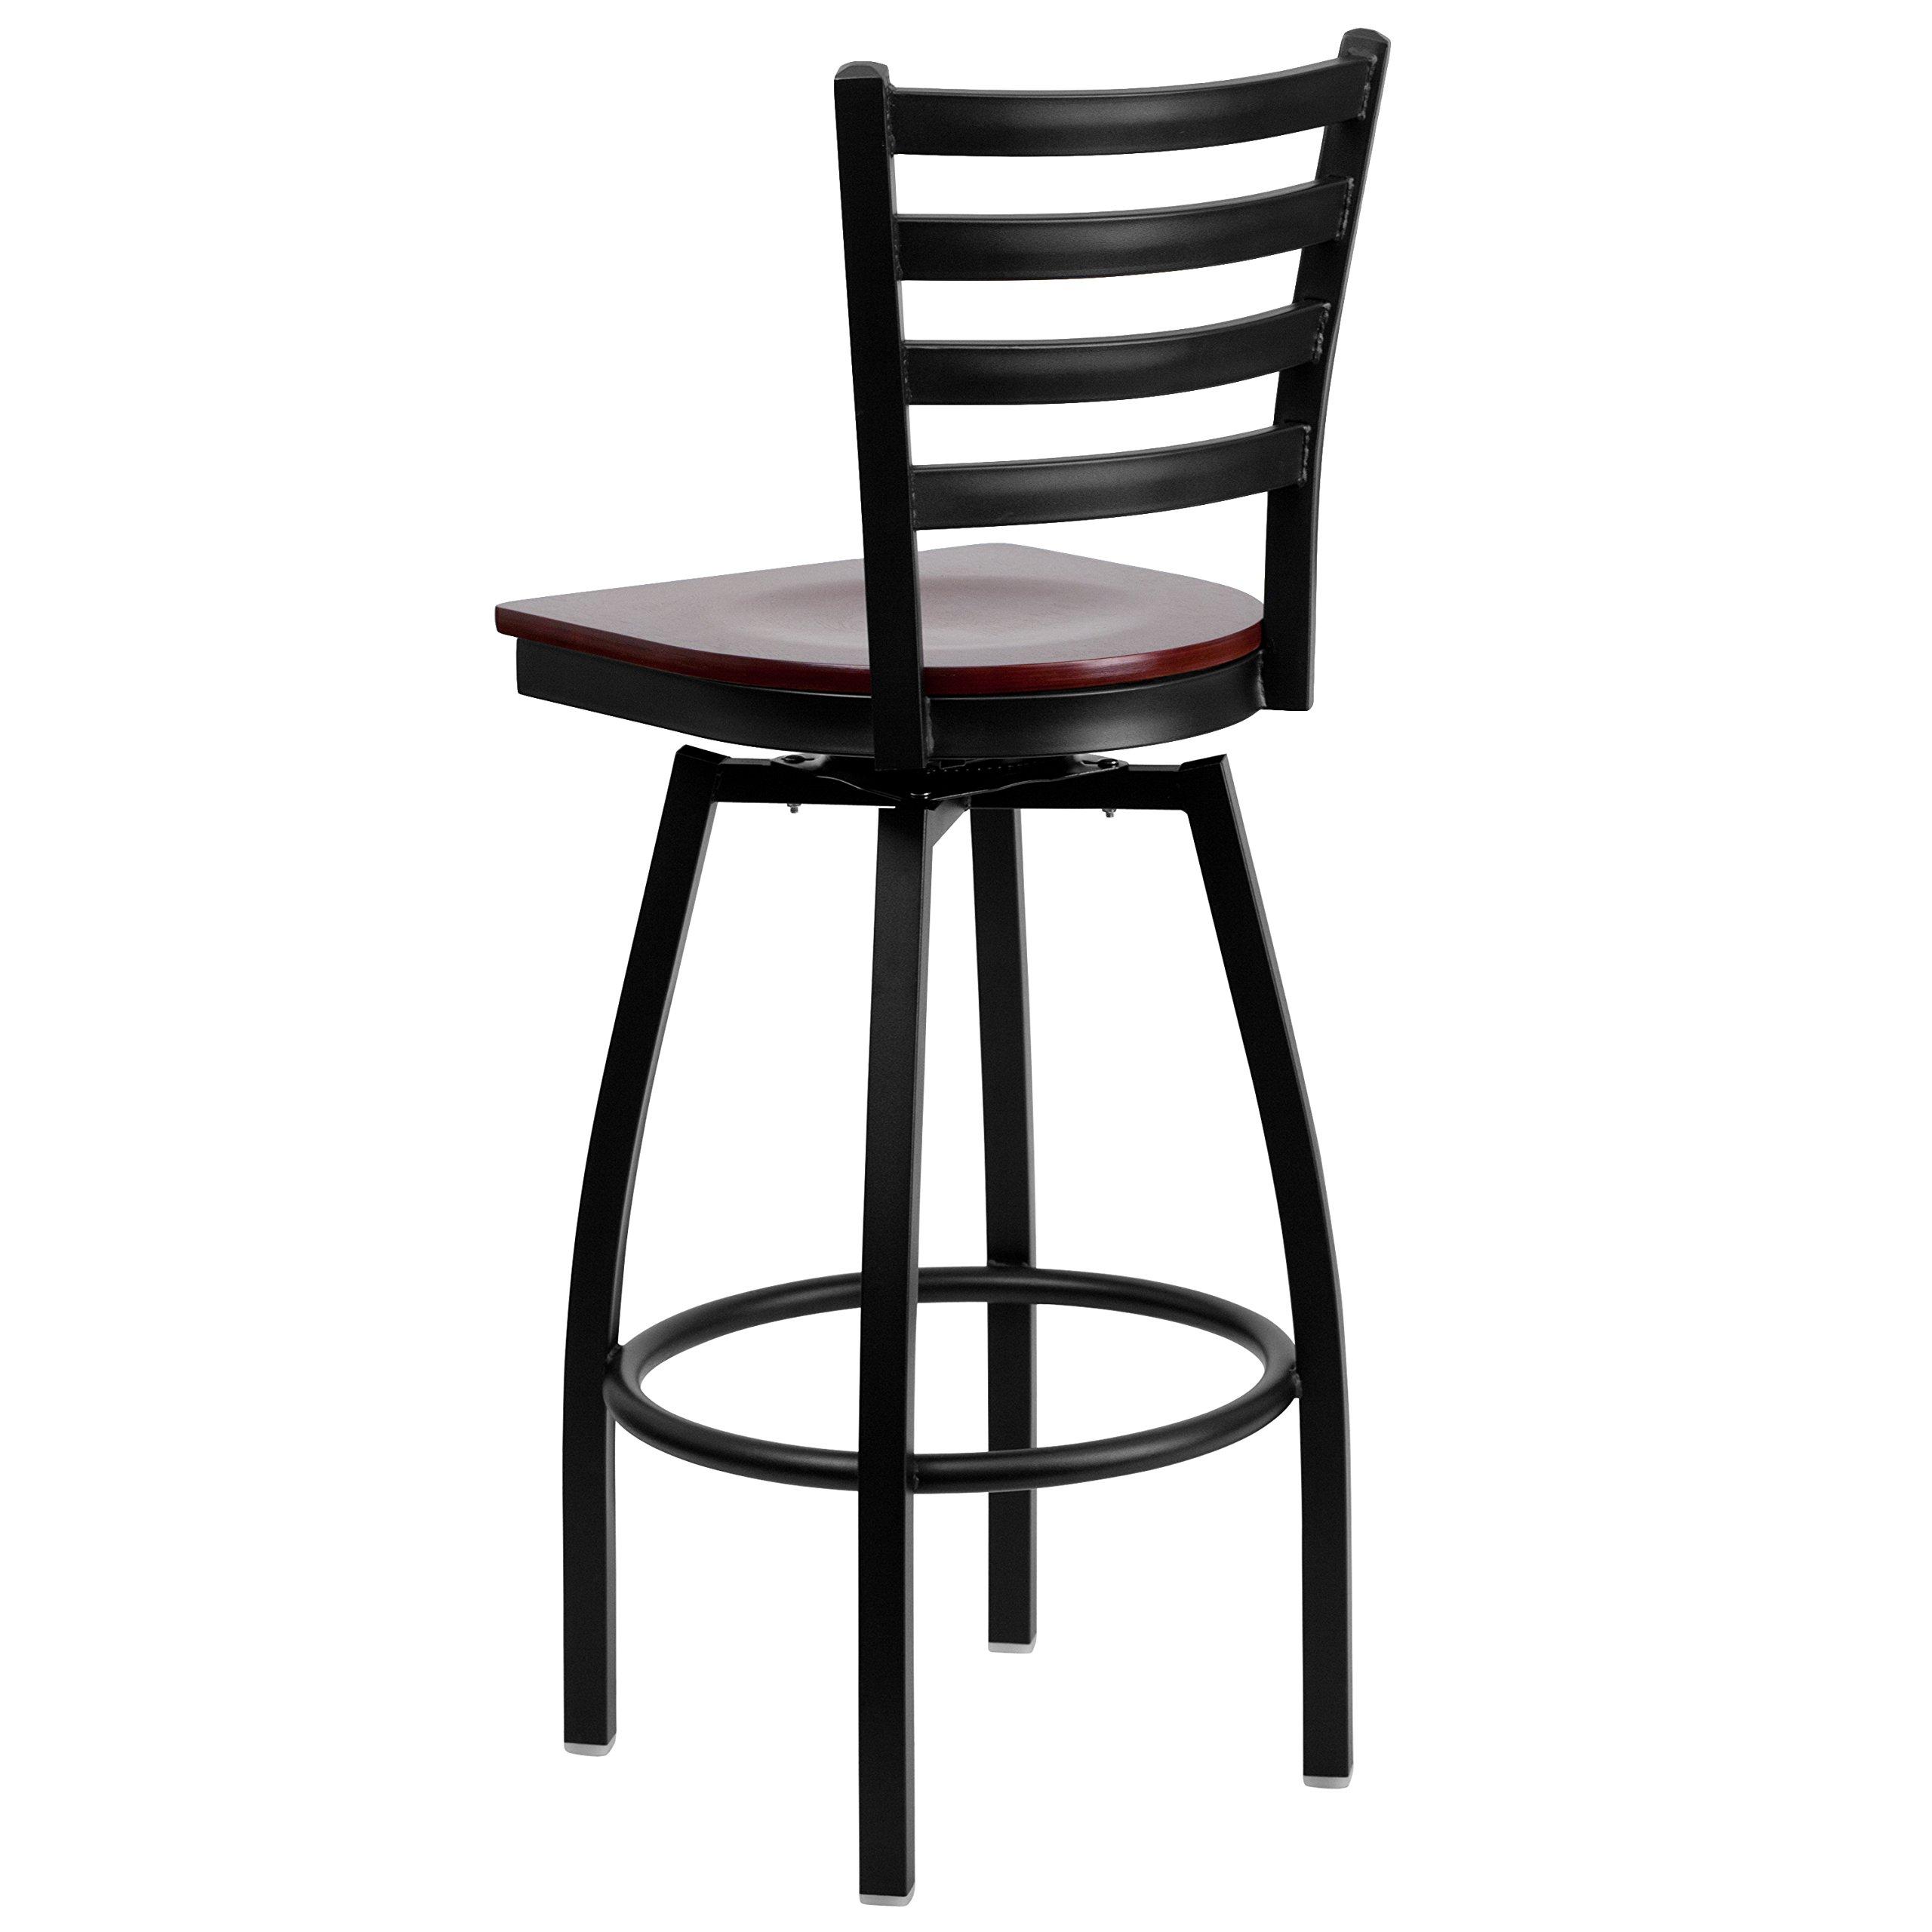 Flash Furniture HERCULES Series Black Ladder Back Swivel Metal Barstool - Mahogany Wood Seat by Flash Furniture (Image #3)